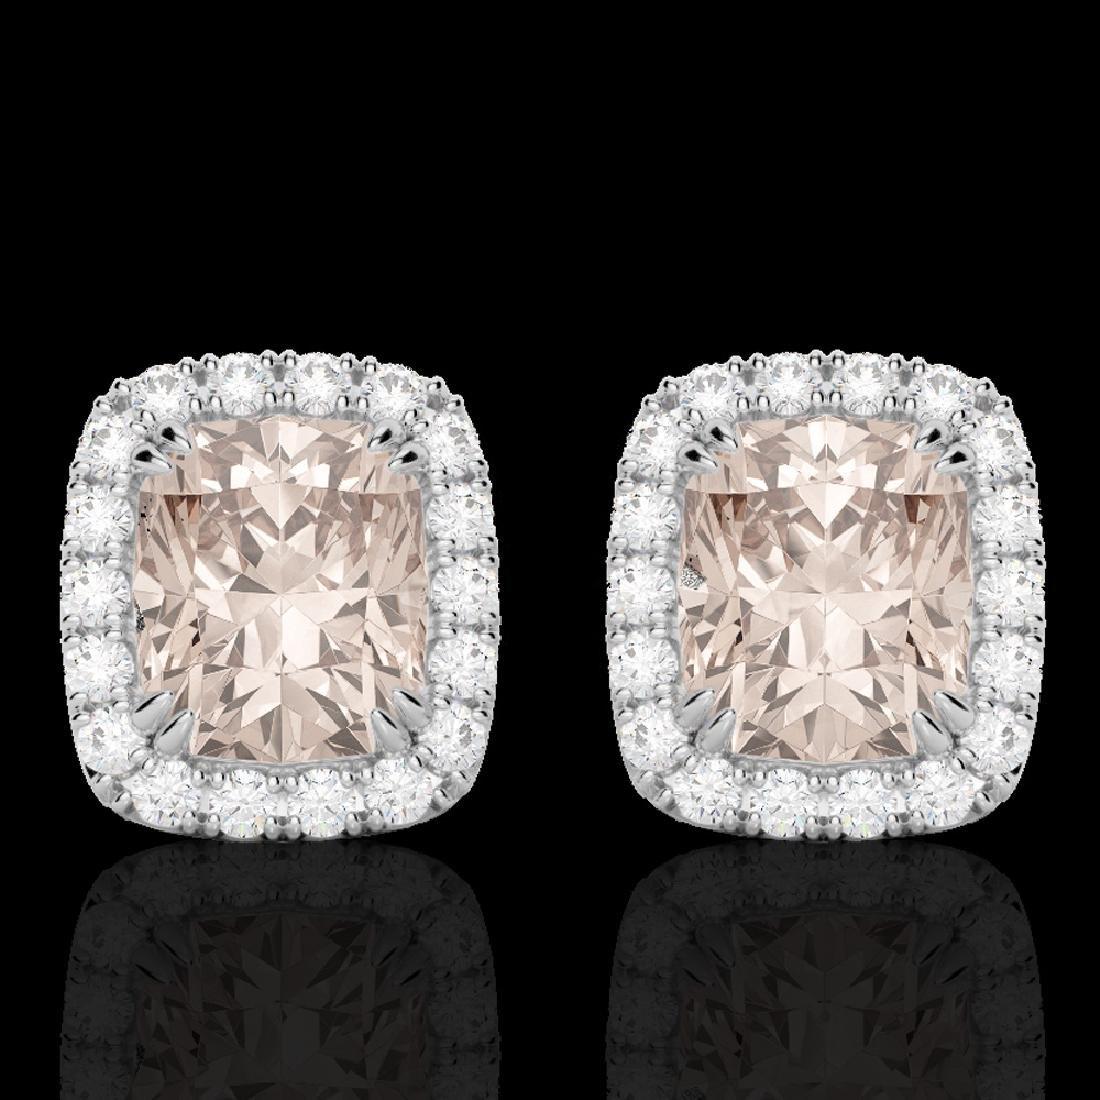 2.50 CTW Morganite & Micro Pave VS/SI Diamond Halo